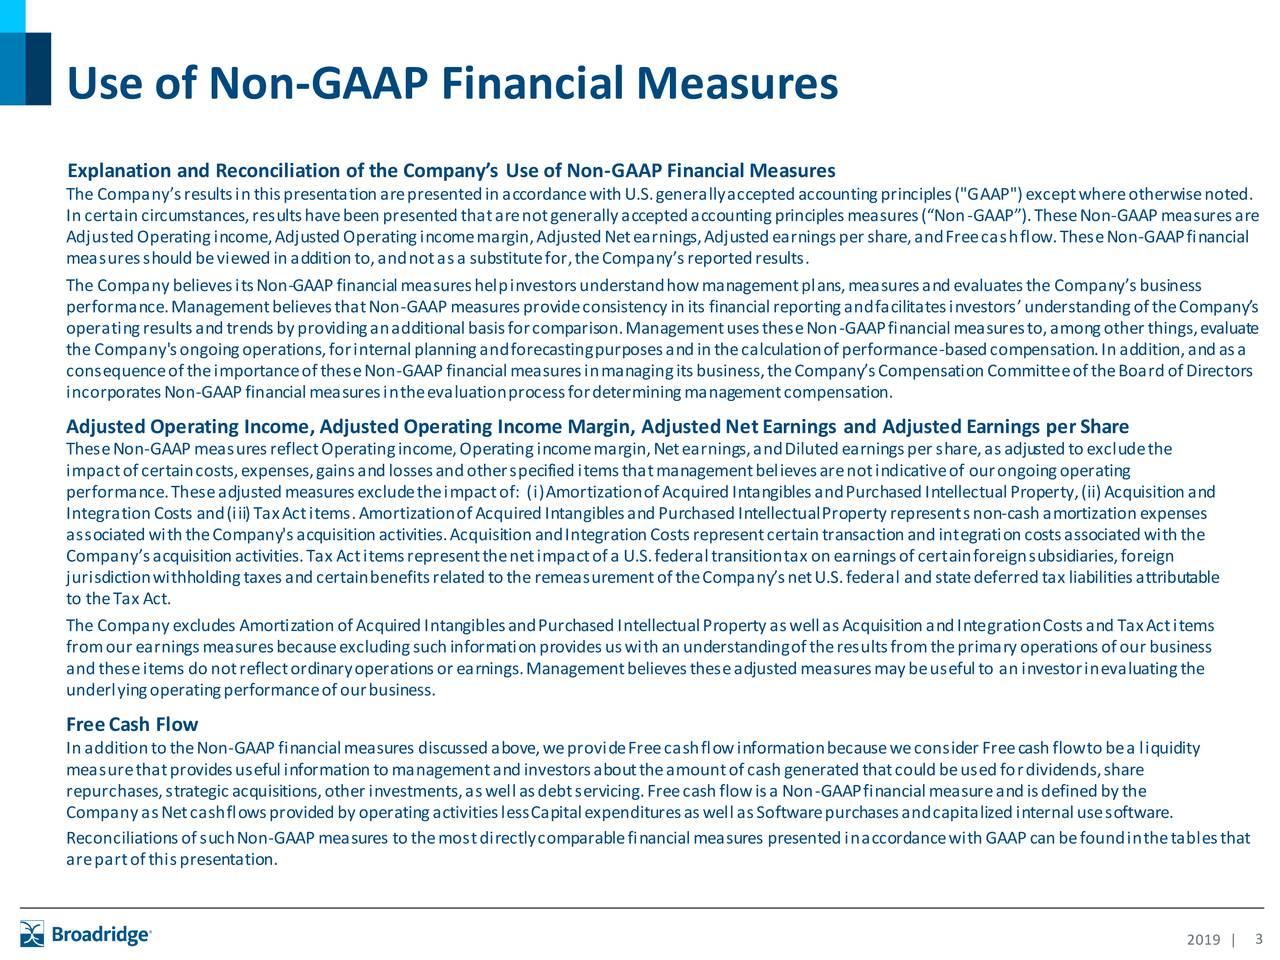 "Explanation and Reconciliation of the Company's Use of Non-GAAP Financial Measures The Company'sresultsinthispresentationarepresentedinaccordancewithU.S.generallyacceptedaccountingprinciples(""GAAP"")exceptwhereotherwisenoted. Incertaincircumstances,resultshavebeenpresentedthatarenotgenerallyacceptedaccountingprinciplesmeasures(""Non-GAAP"").TheseNon-GAAPmeasuresare AdjustedOperatingincome,AdjustedOperatingincomemargin,AdjustedNetearnings,Adjustedearningspershare,andFreecashflow.TheseNon-GAAPfinancial measuresshouldbeviewedinadditionto,andnotasa substitutefor,theCompany'sreportedresults. The CompanybelievesitsNon-GAAPfinancialmeasureshelpinvestorsunderstandhowmanagementplans,measuresandevaluatestheCompany'sbusiness performance.ManagementbelievesthatNon-GAAPmeasuresprovideconsistencyinits financialreportingandfacilitatesinvestors'understandingoftheCompany's operatingresultsandtrendsbyprovidinganadditionalbasisforcomparison.ManagementusestheseNon-GAAPfinancialmeasuresto,amongotherthings,evaluate the Company'songoingoperations,forinternalplanningandforecastingpurposesandinthecalculationofperformance-basedcompensation.Inaddition,andasa consequenceoftheimportanceoftheseNon-GAAPfinancialmeasuresinmanagingitsbusiness,theCompany'sCompensationCommitteeoftheBoardofDirectors incorporatesNon-GAAPfinancialmeasuresintheevaluationprocessfordeterminingmanagementcompensation. AdjustedOperating Income, AdjustedOperating Income Margin, AdjustedNetEarnings and AdjustedEarnings perShare TheseNon-GAAPmeasuresreflectOperatingincome,Operatingincomemargin,Netearnings,andDilutedearningspershare,asadjustedtoexcludethe impactofcertaincosts,expenses,gainsandlossesandotherspecifieditemsthatmanagementbelievesarenotindicativeof ourongoingoperating performance.Theseadjustedmeasuresexcludetheimpactof: (i)AmortizationofAcquiredIntangiblesandPurchasedIntellectualProperty,(ii)Acquisitionand IntegrationCosts and(iii)TaxActitems.AmortizationofAcquiredIntangiblesandPurchasedIntellectualPropertyrepresentsnon-c"